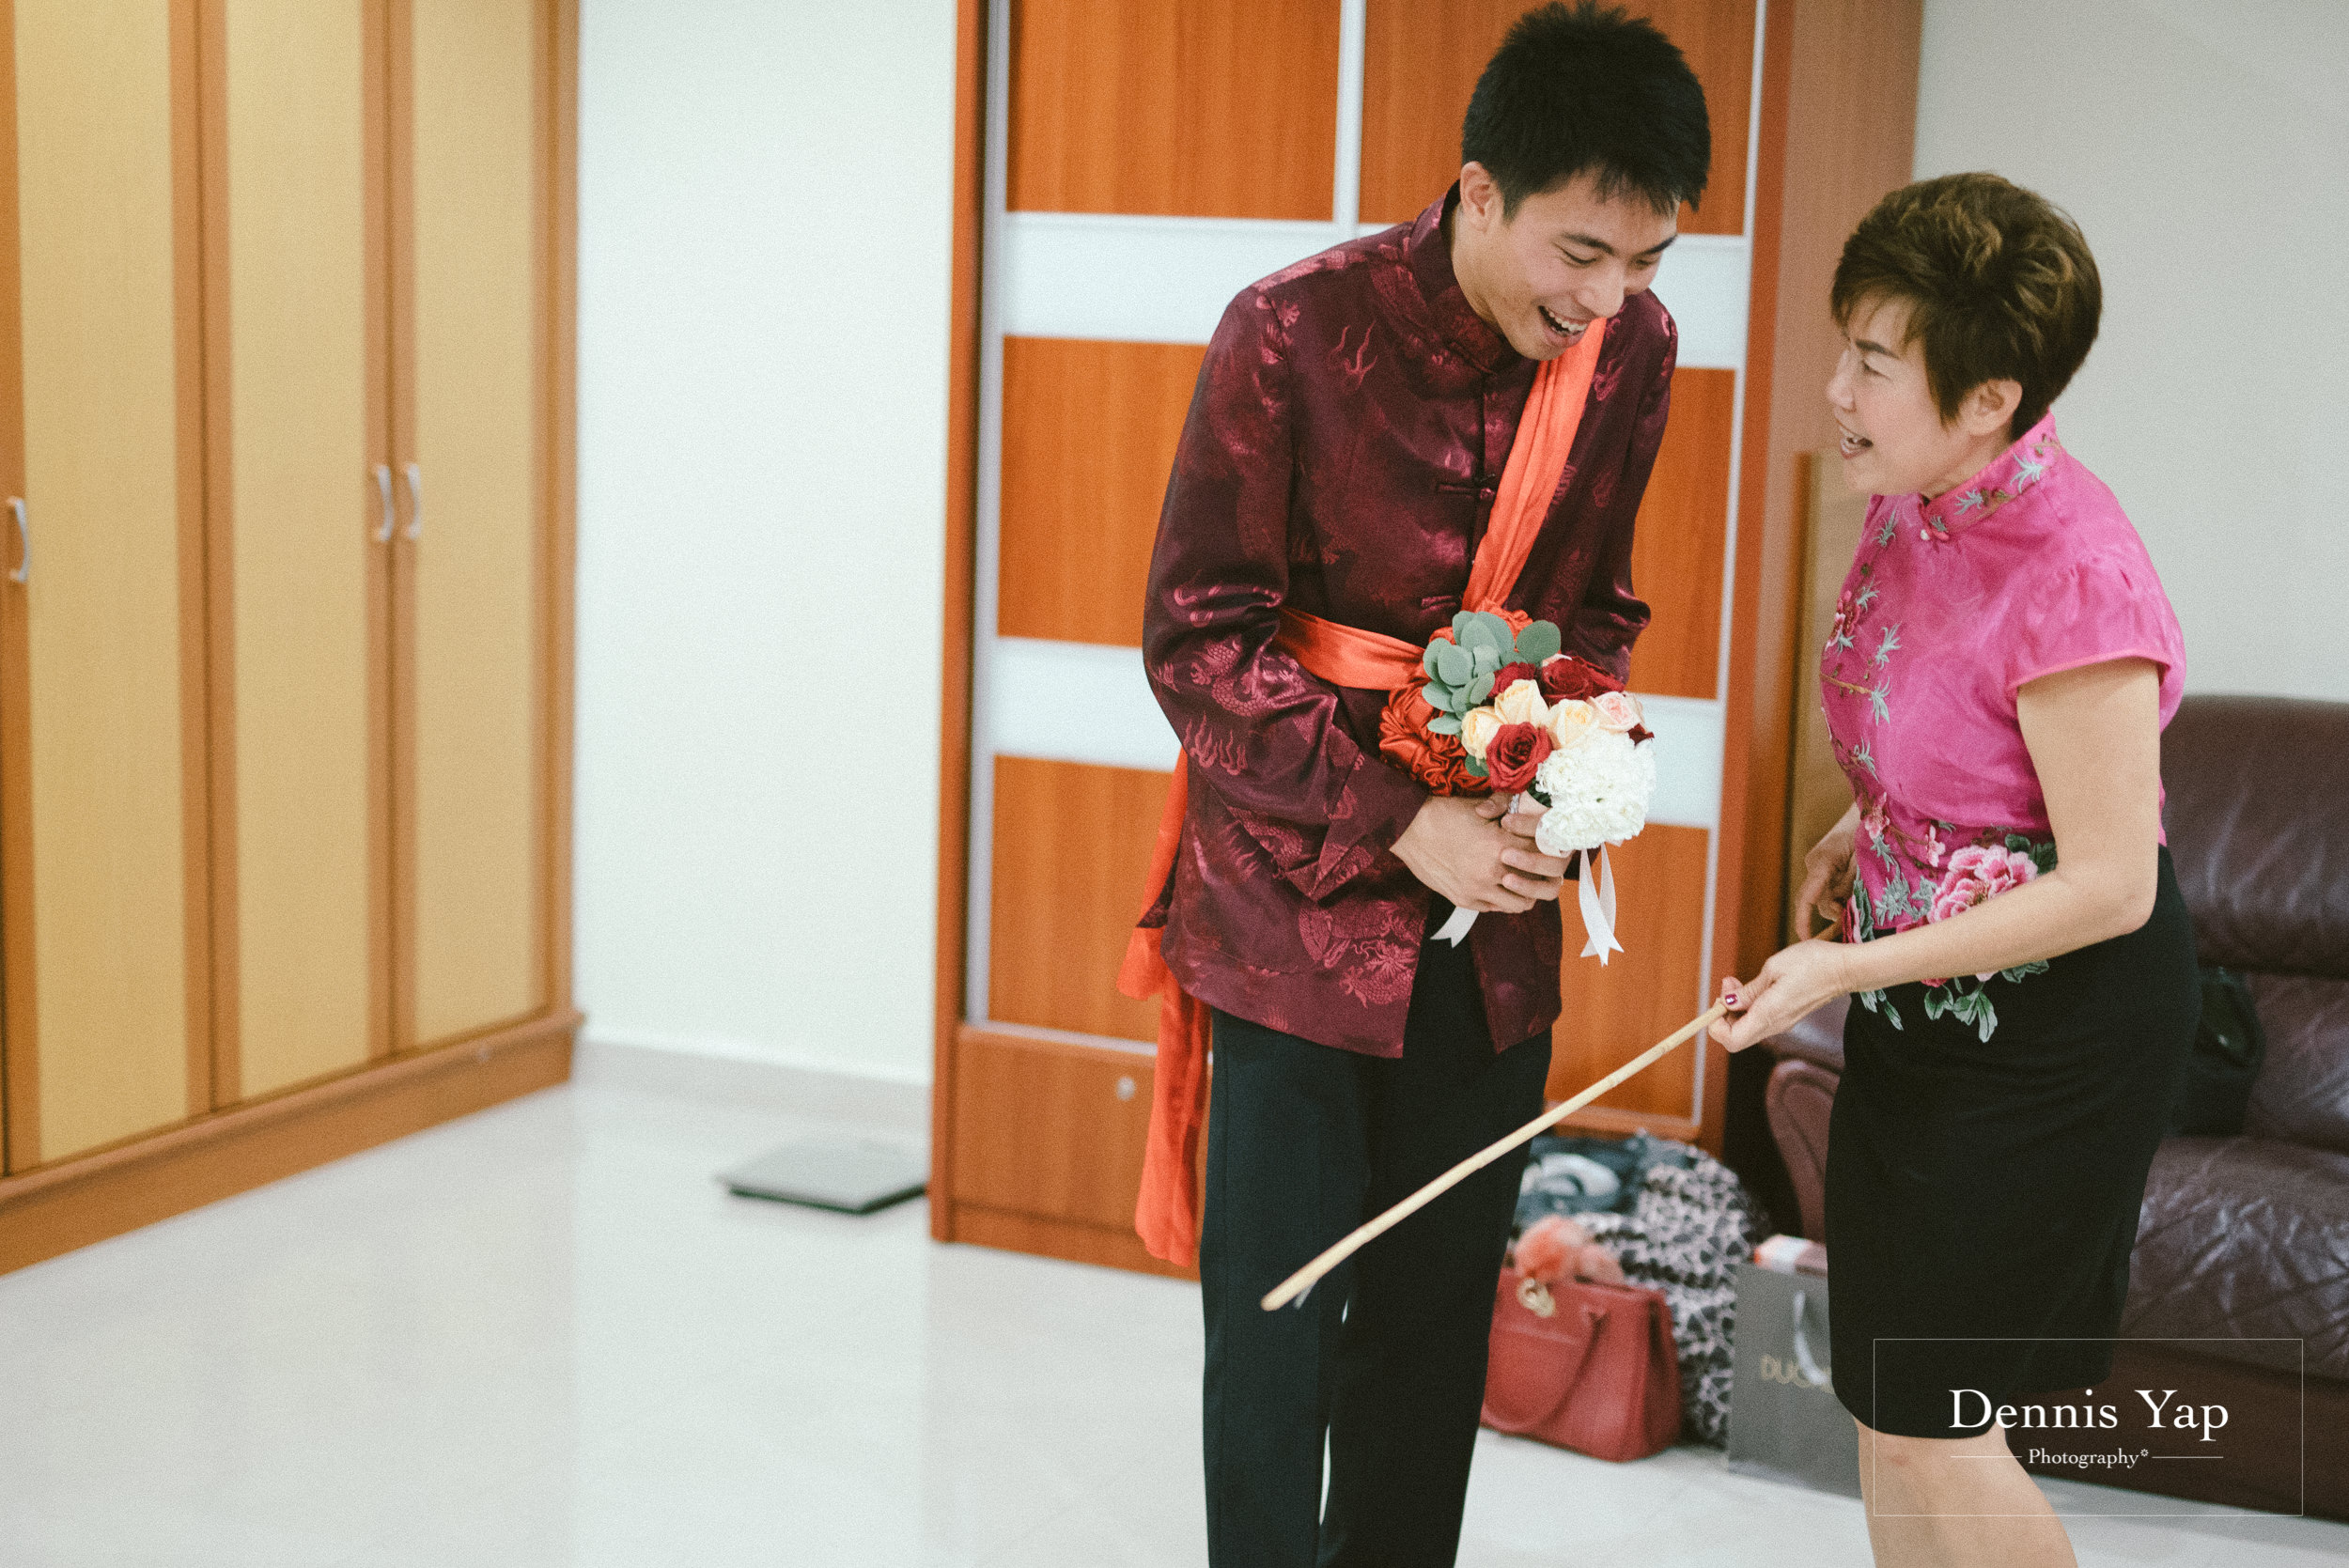 justin hsin wedding day ciao ristorante kuala lumpur dennis yap photography-12.jpg